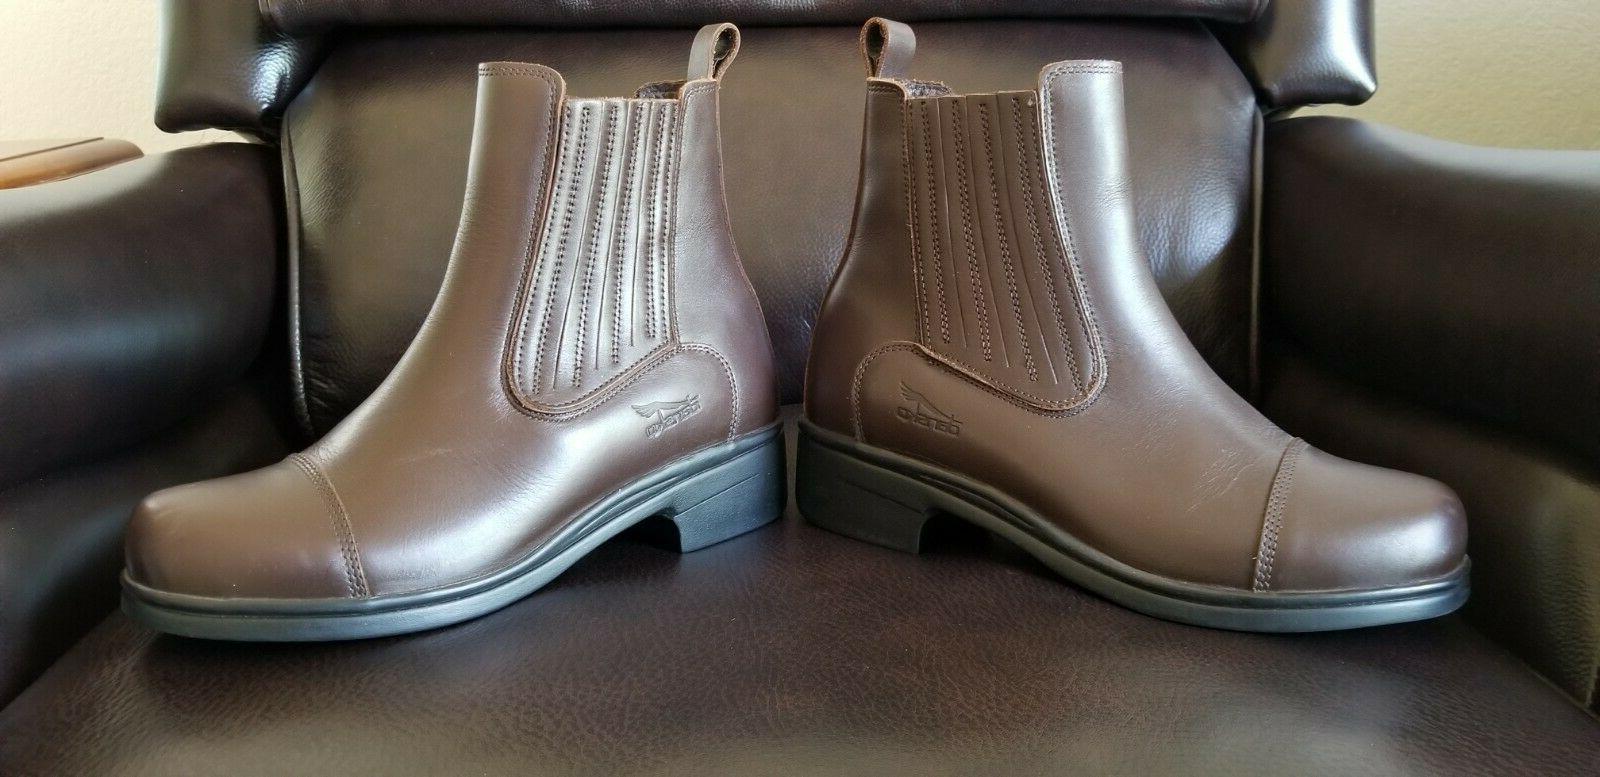 Dansko PADDOCK Boots Womens Size 8 Brown Pull-On